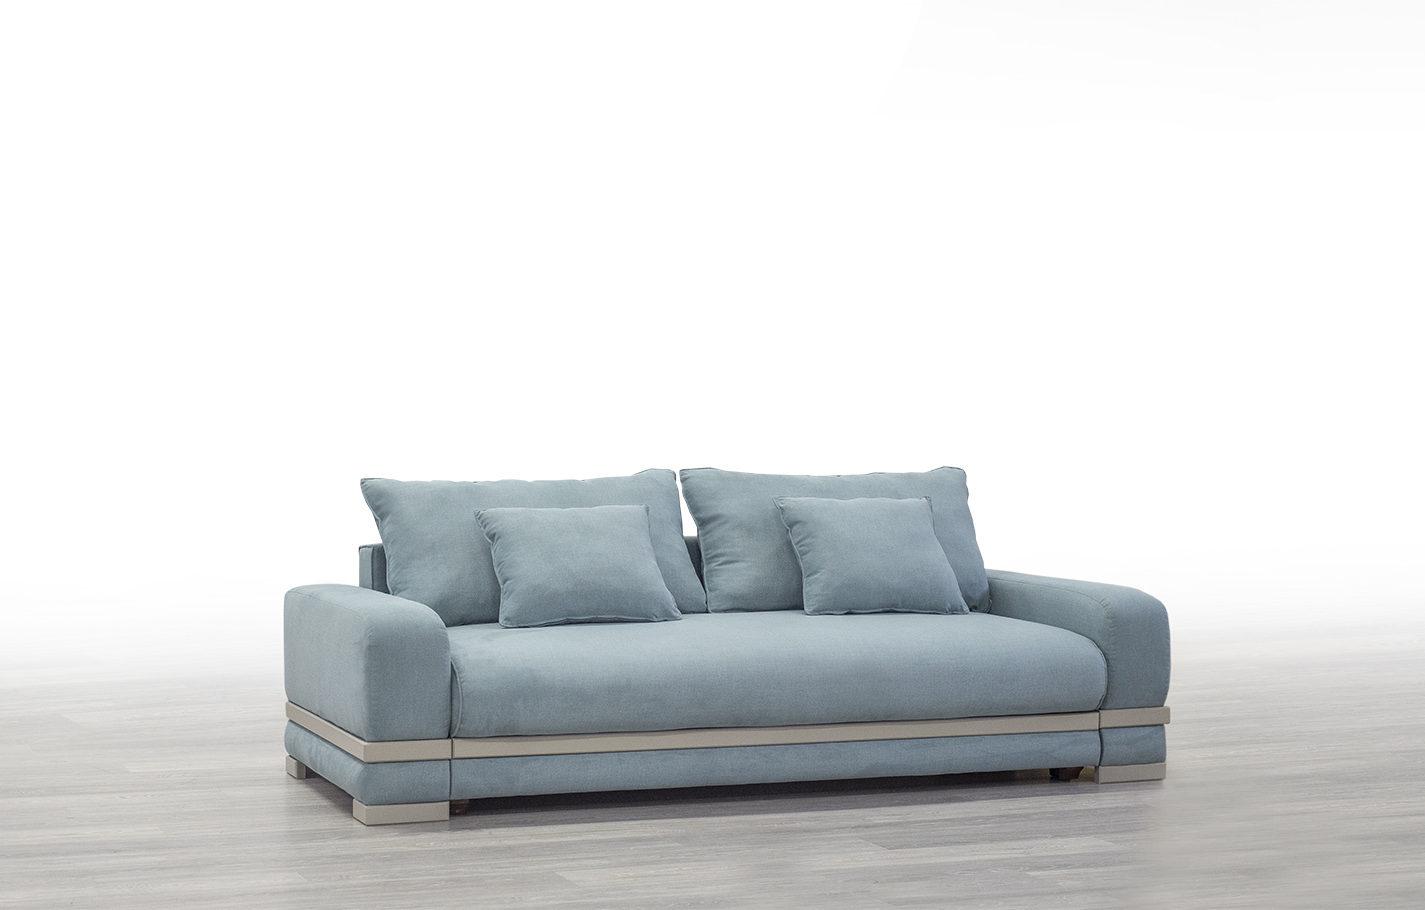 sofa_komfort_5-e1542188224427